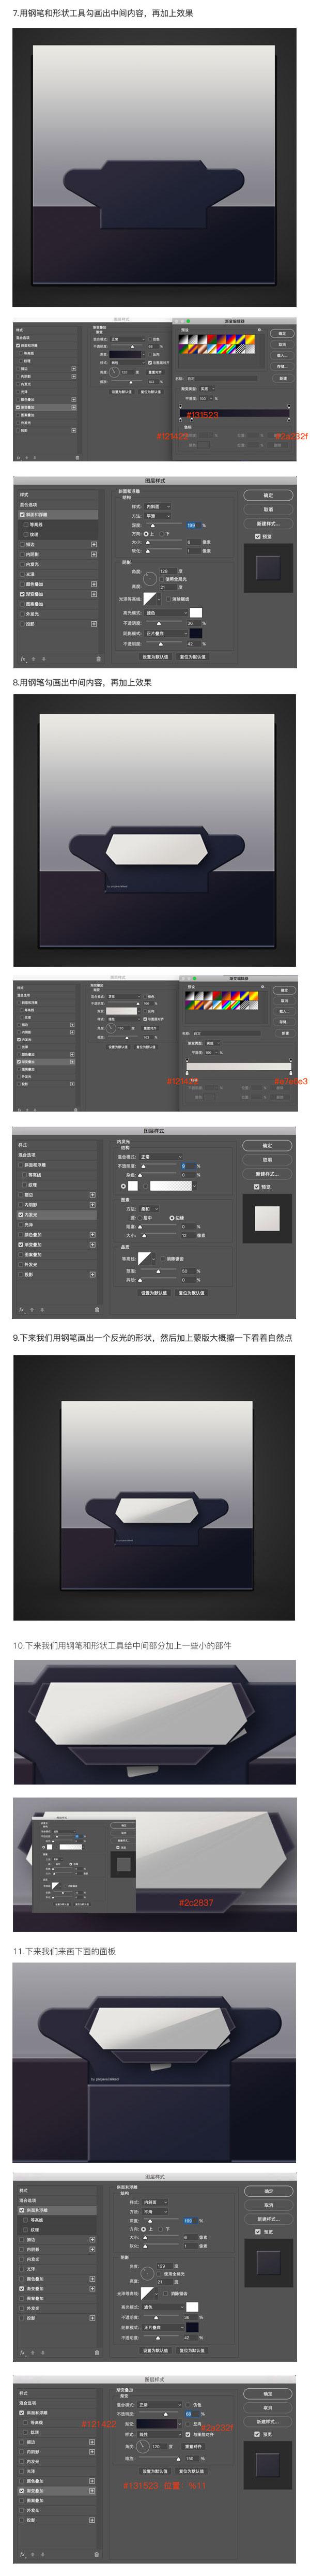 Photoshop繪製立體質感的錄音機圖標